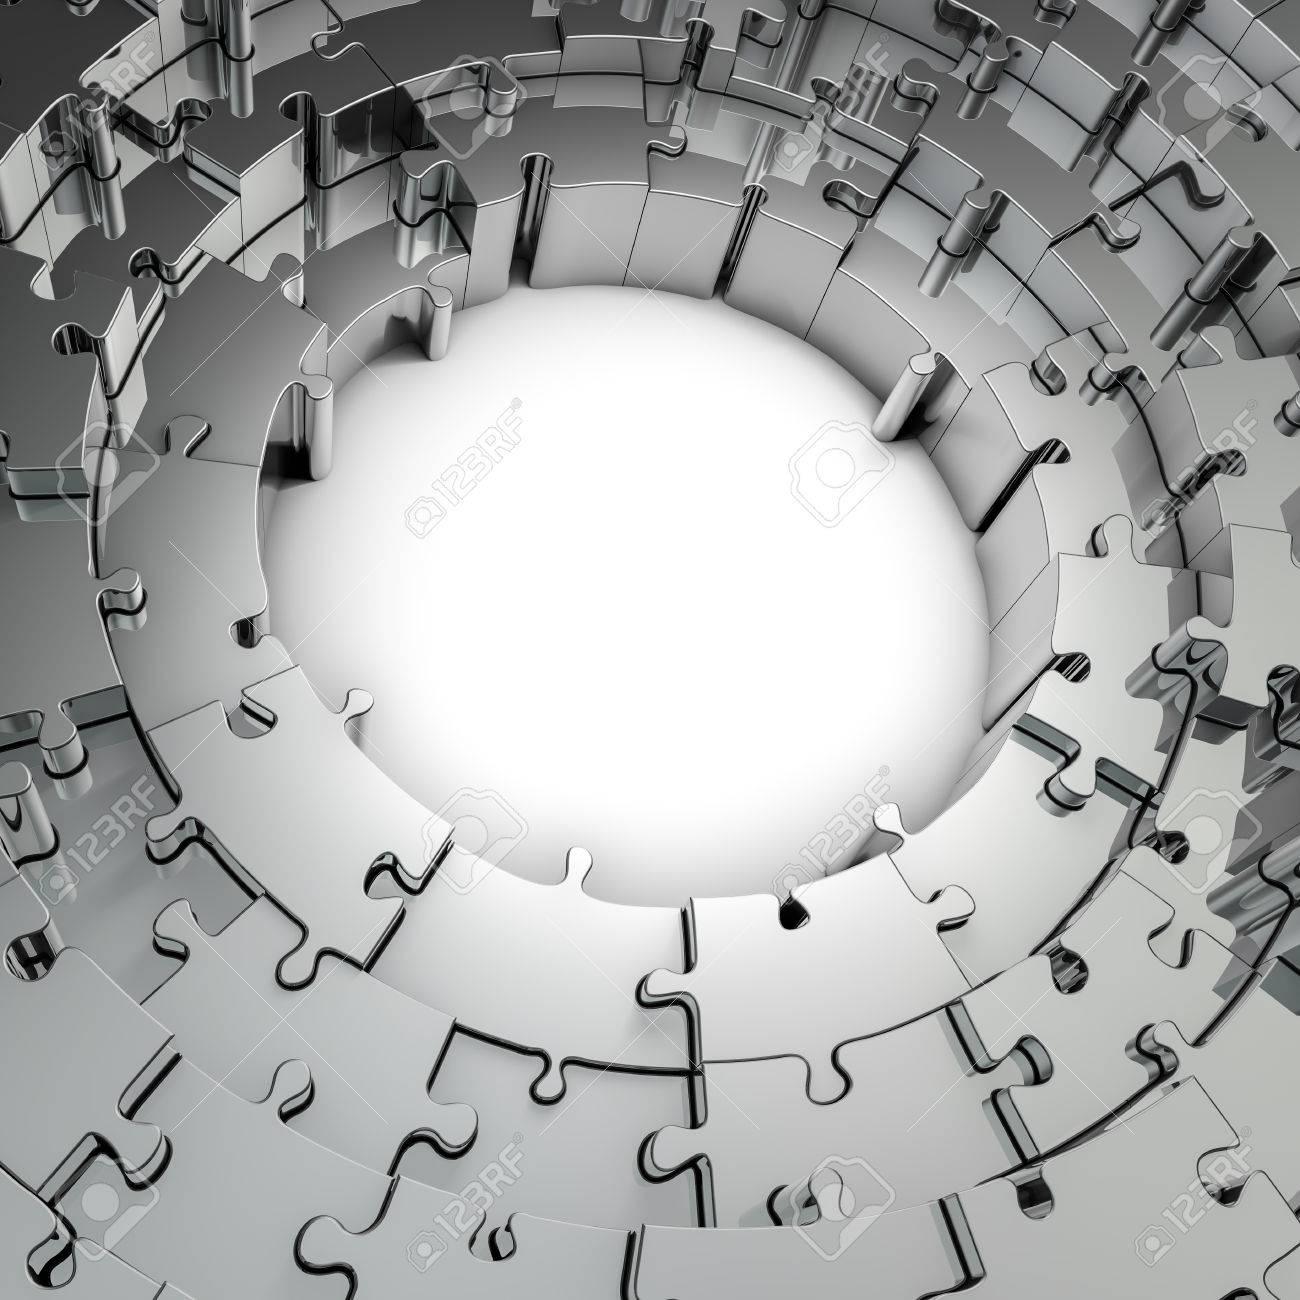 Metal Puzzle Frame, 3D Render Of Metallic Circular Puzzle Pieces ...